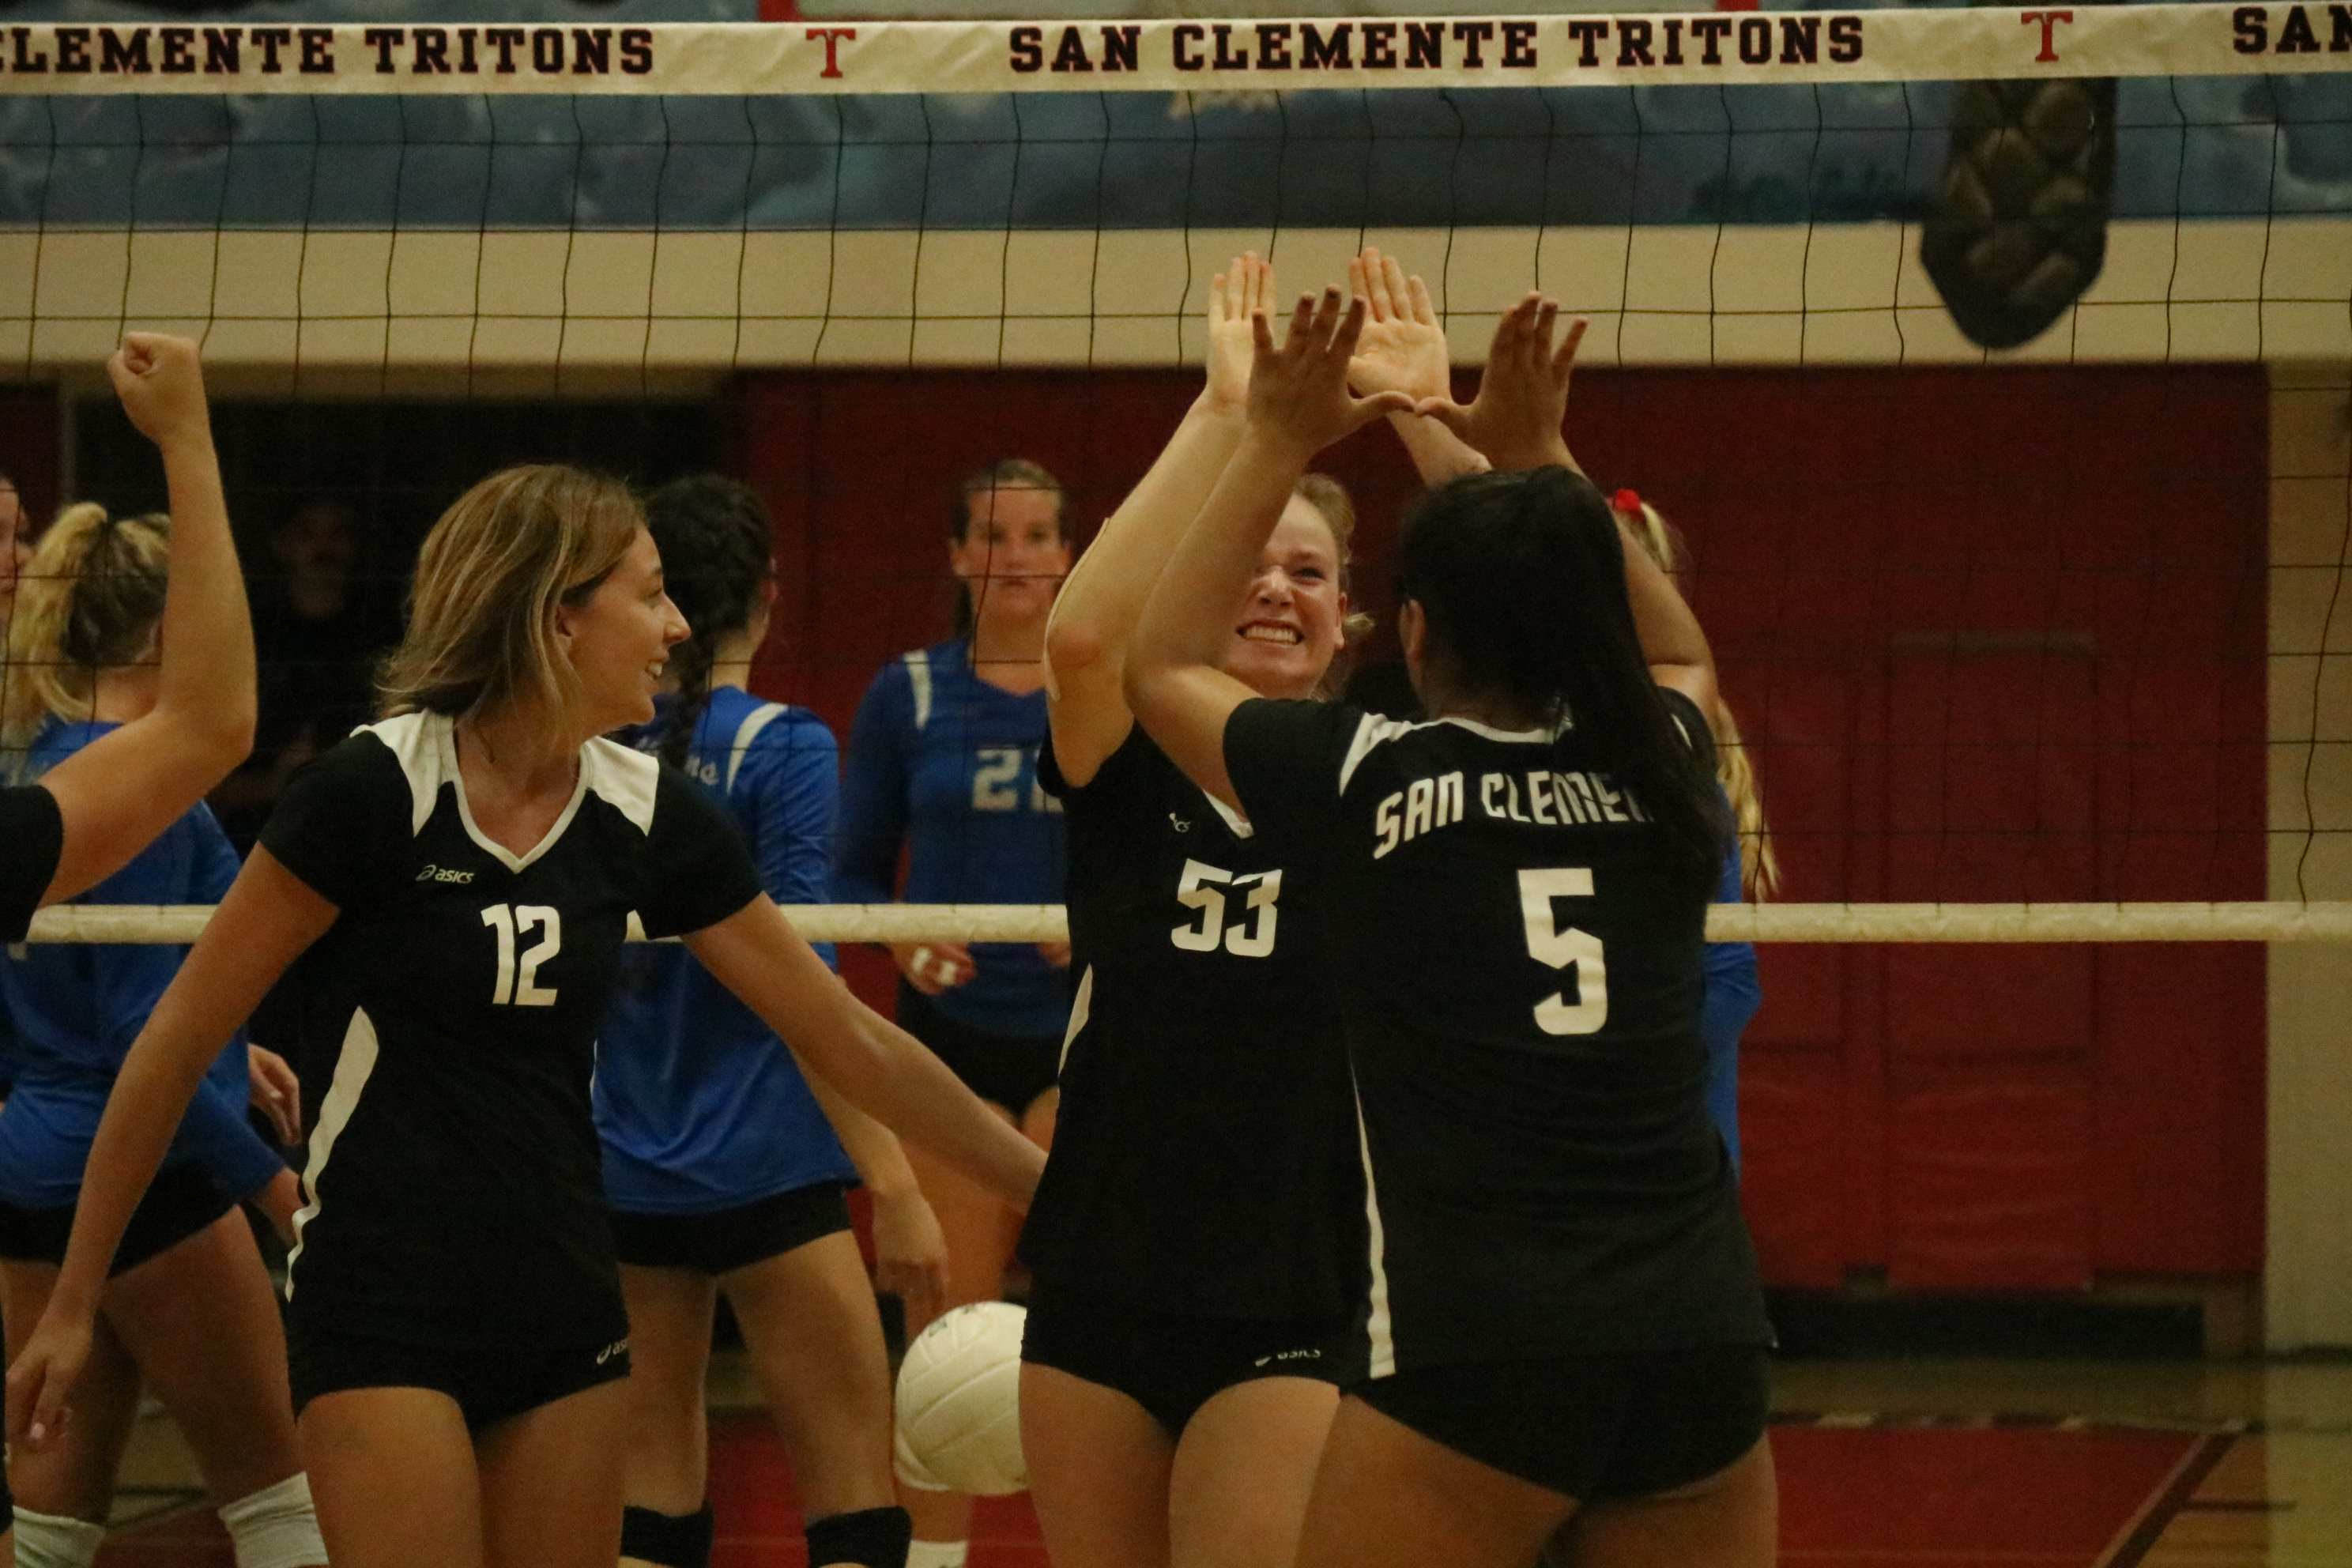 San Clemente upset and swept No. 3 seed Dana Hills in a CIF-SS Division 2 quarterfinal match. Photo: Zach Cavanagh